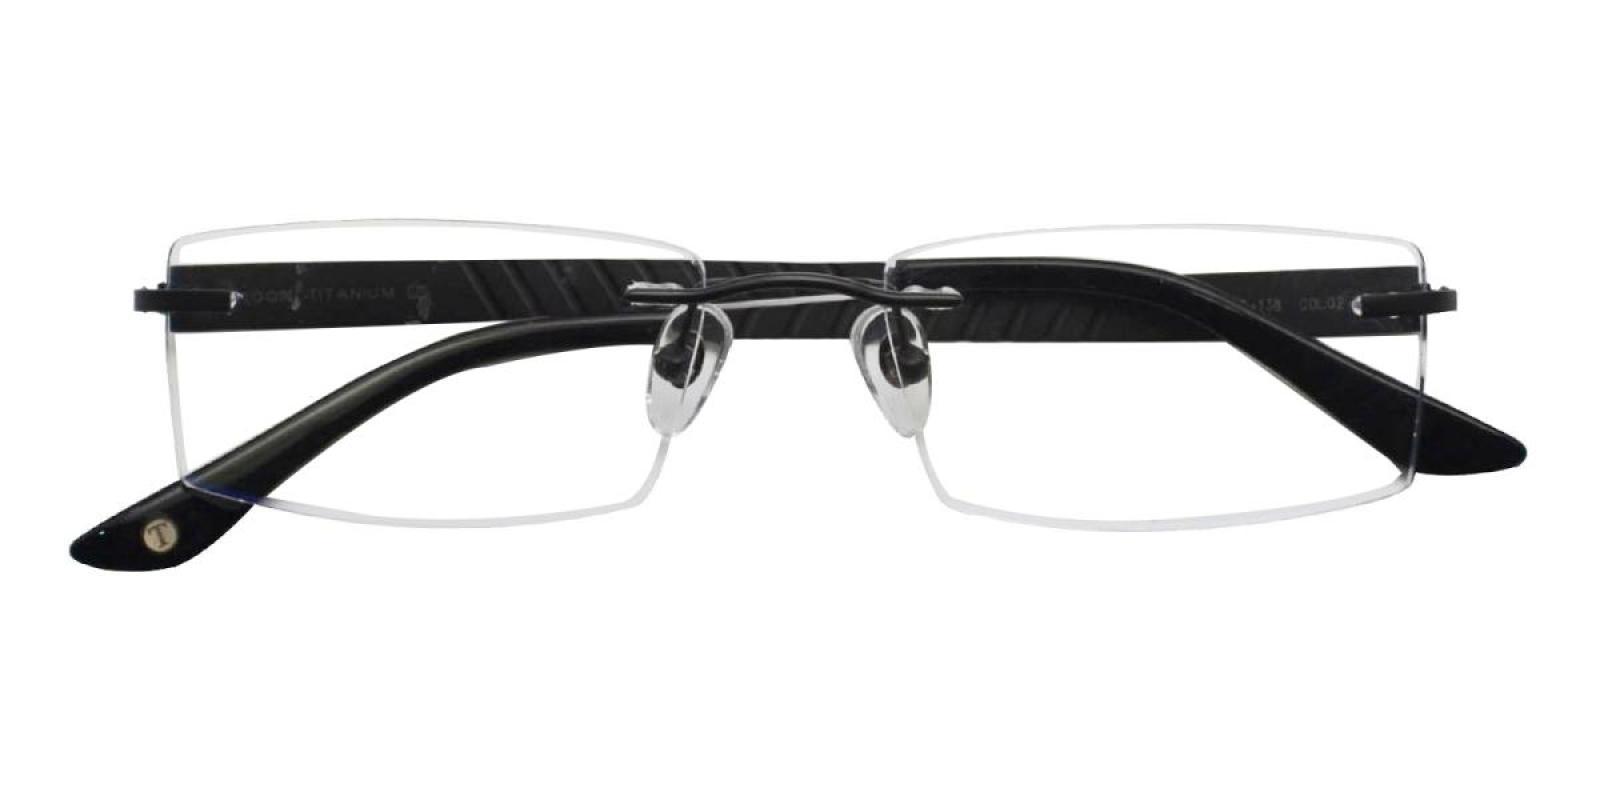 Blaymond-Gun-Varieties-Titanium-Eyeglasses-detail